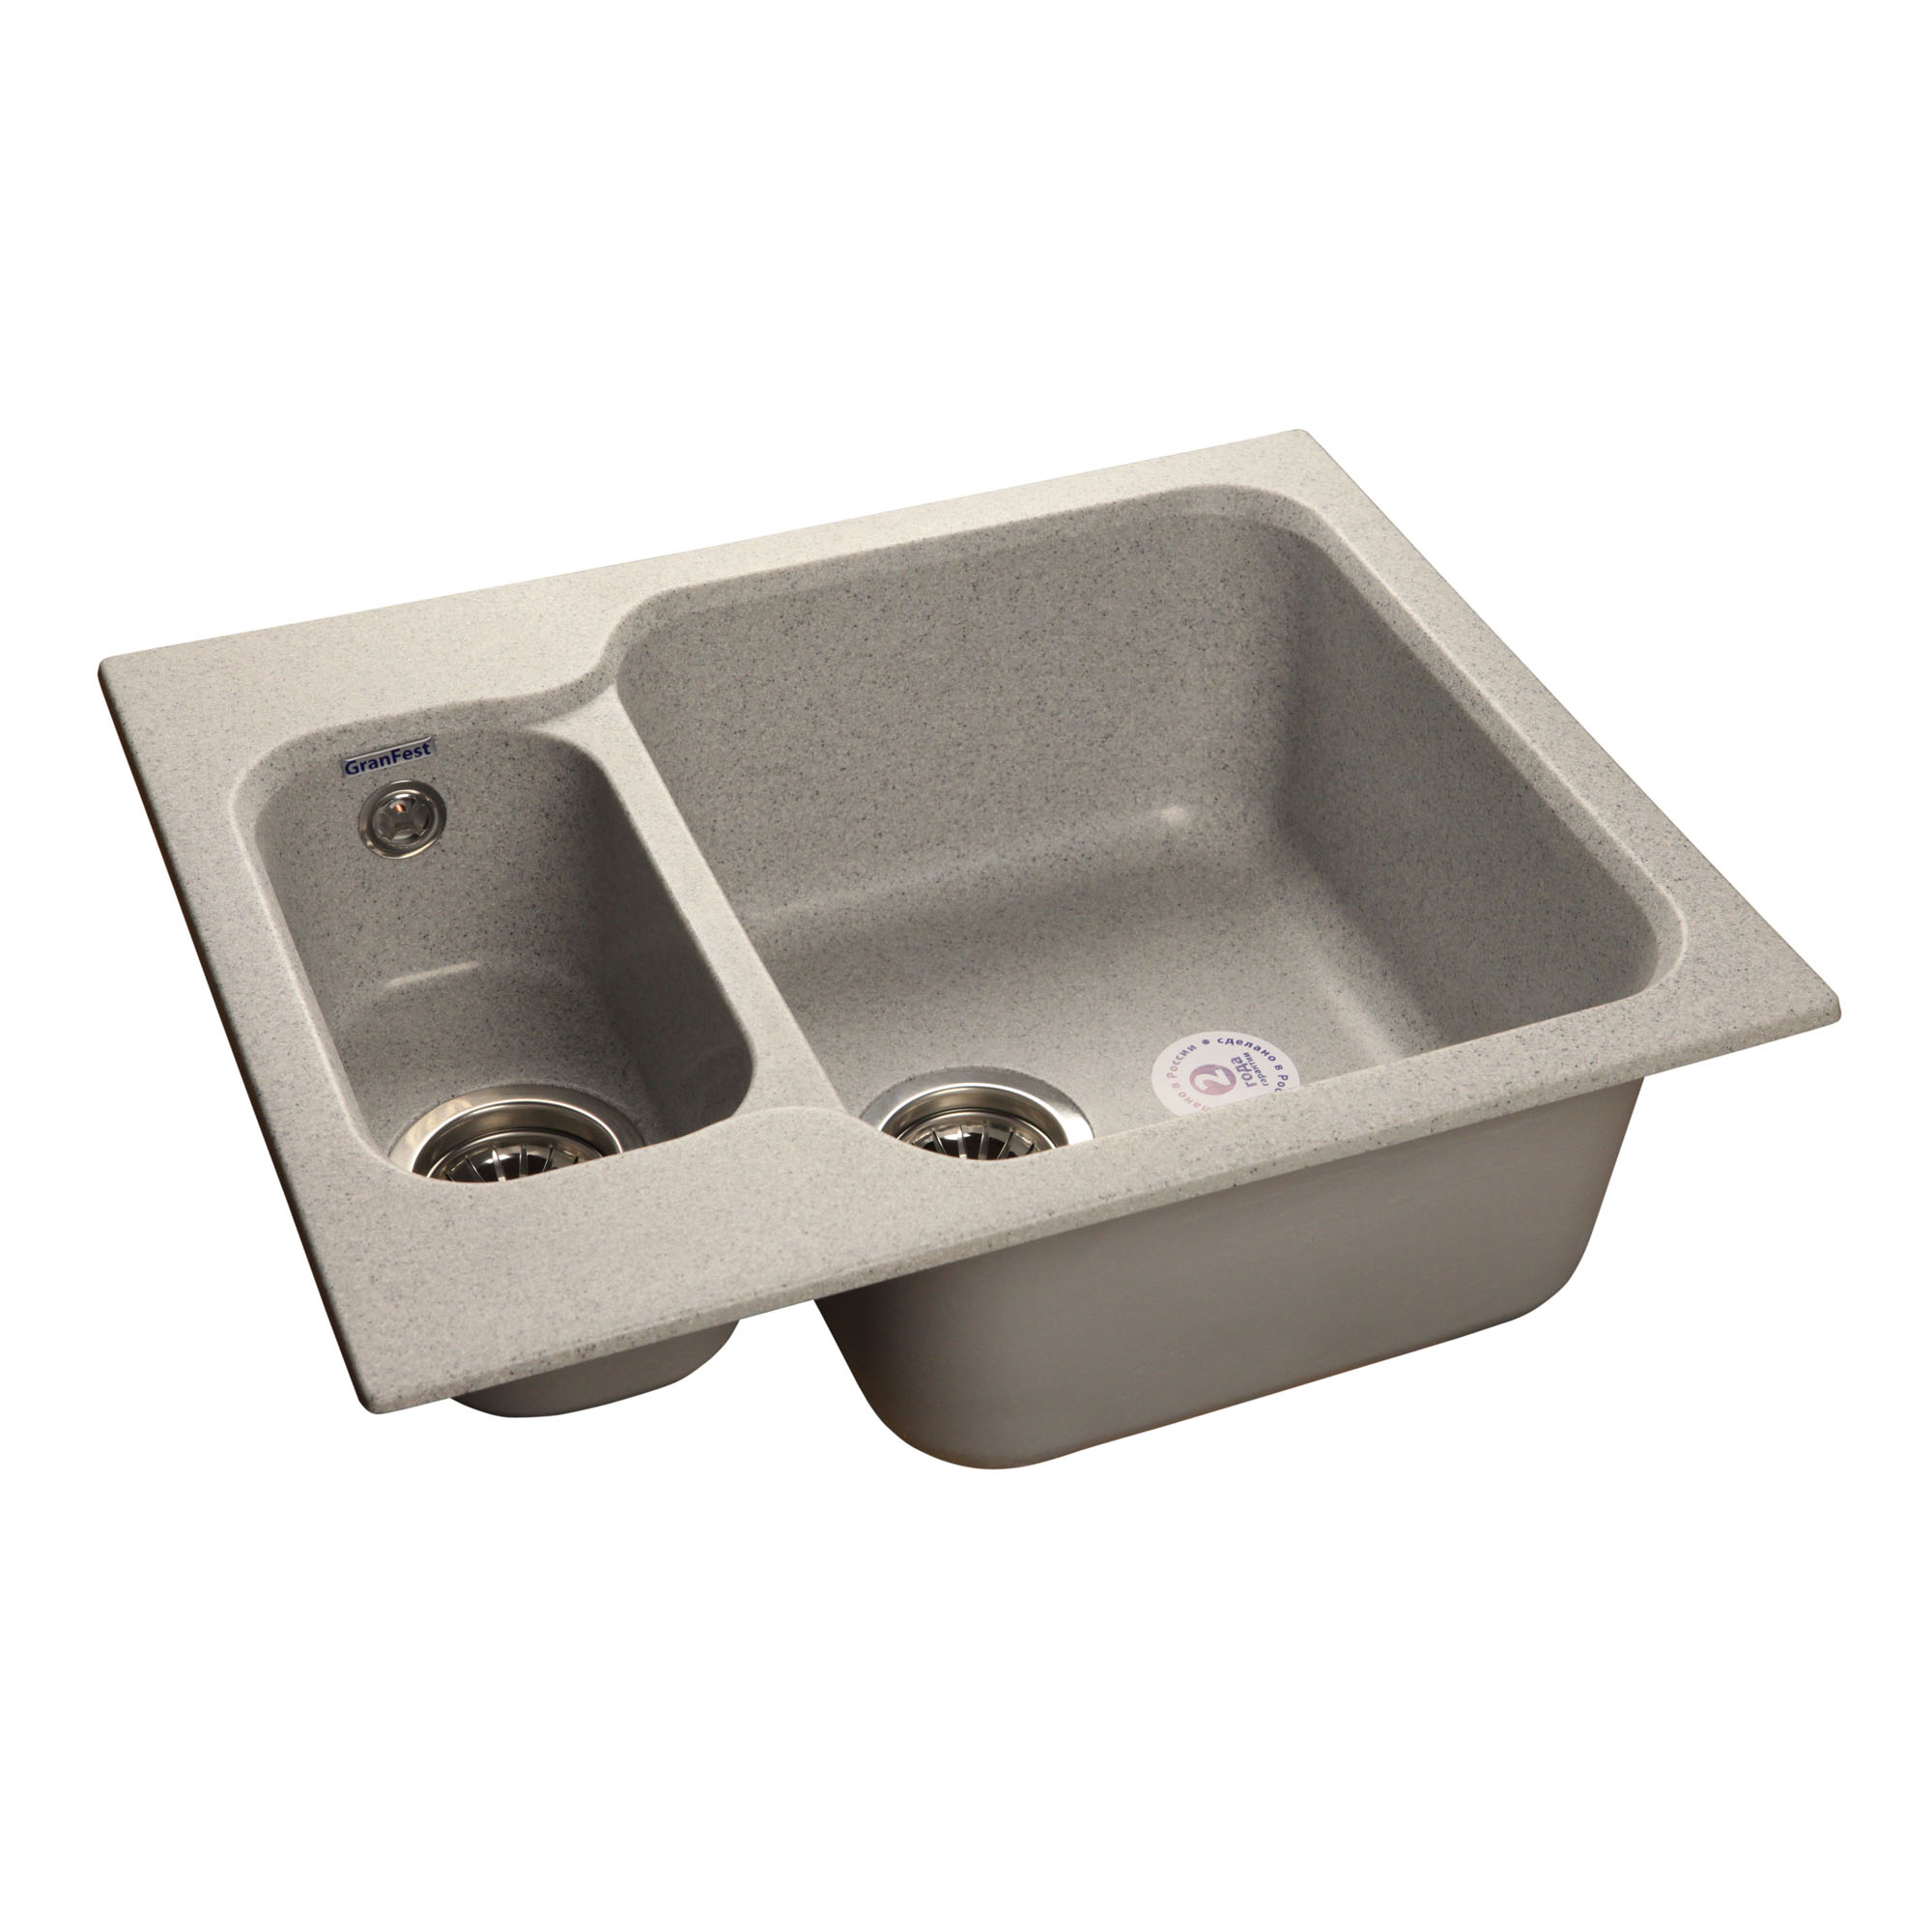 Кухонная мойка GranFest Standart GF-S615K серый мойка кухонная granfest гранит 615x500 gf s615k терракот